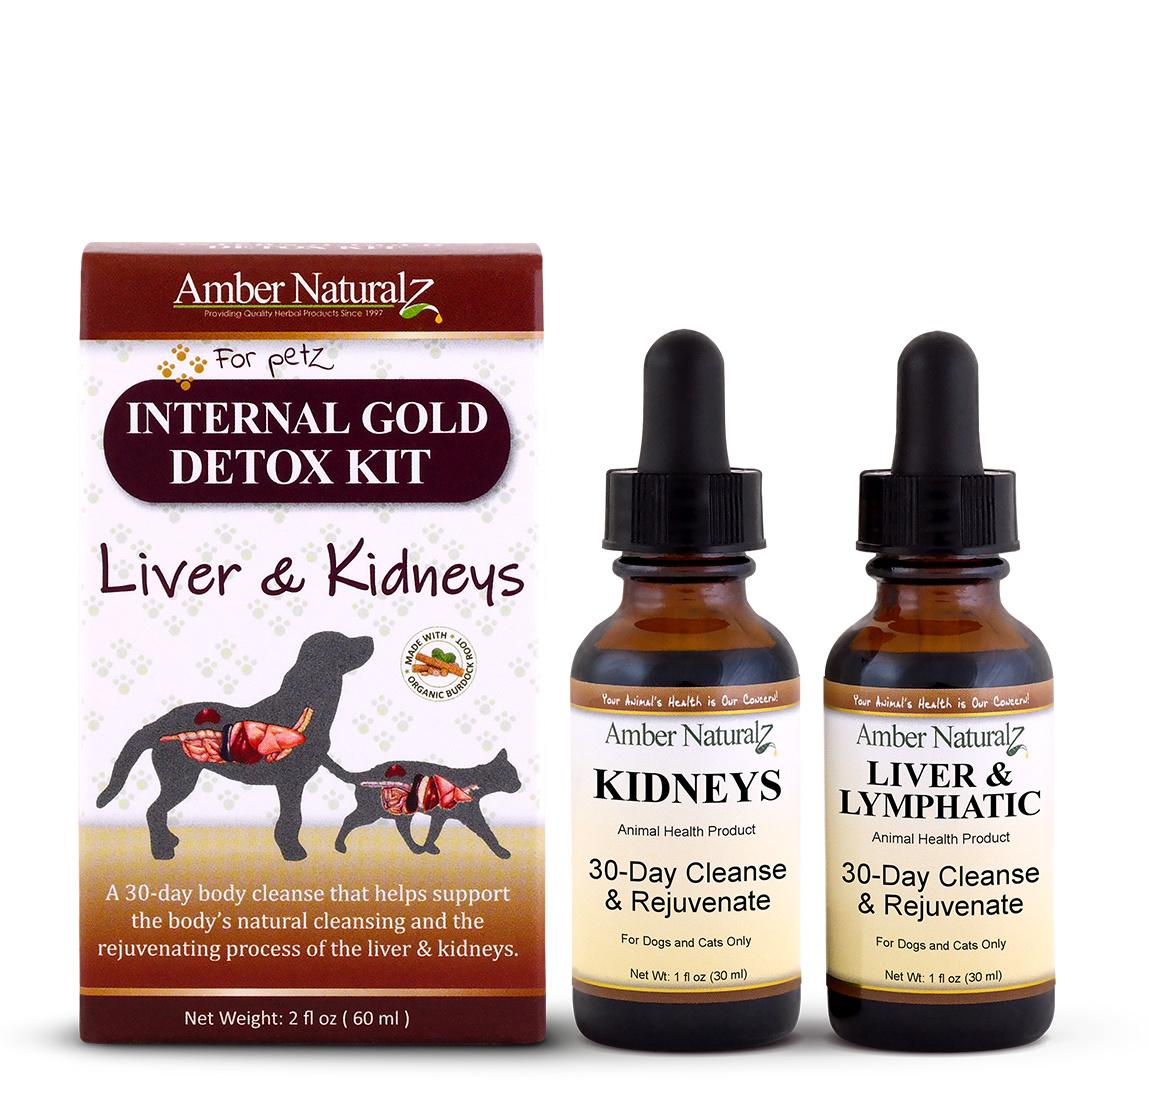 Amber Naturalz Amber Naturalz Internal Gold Detox Kit